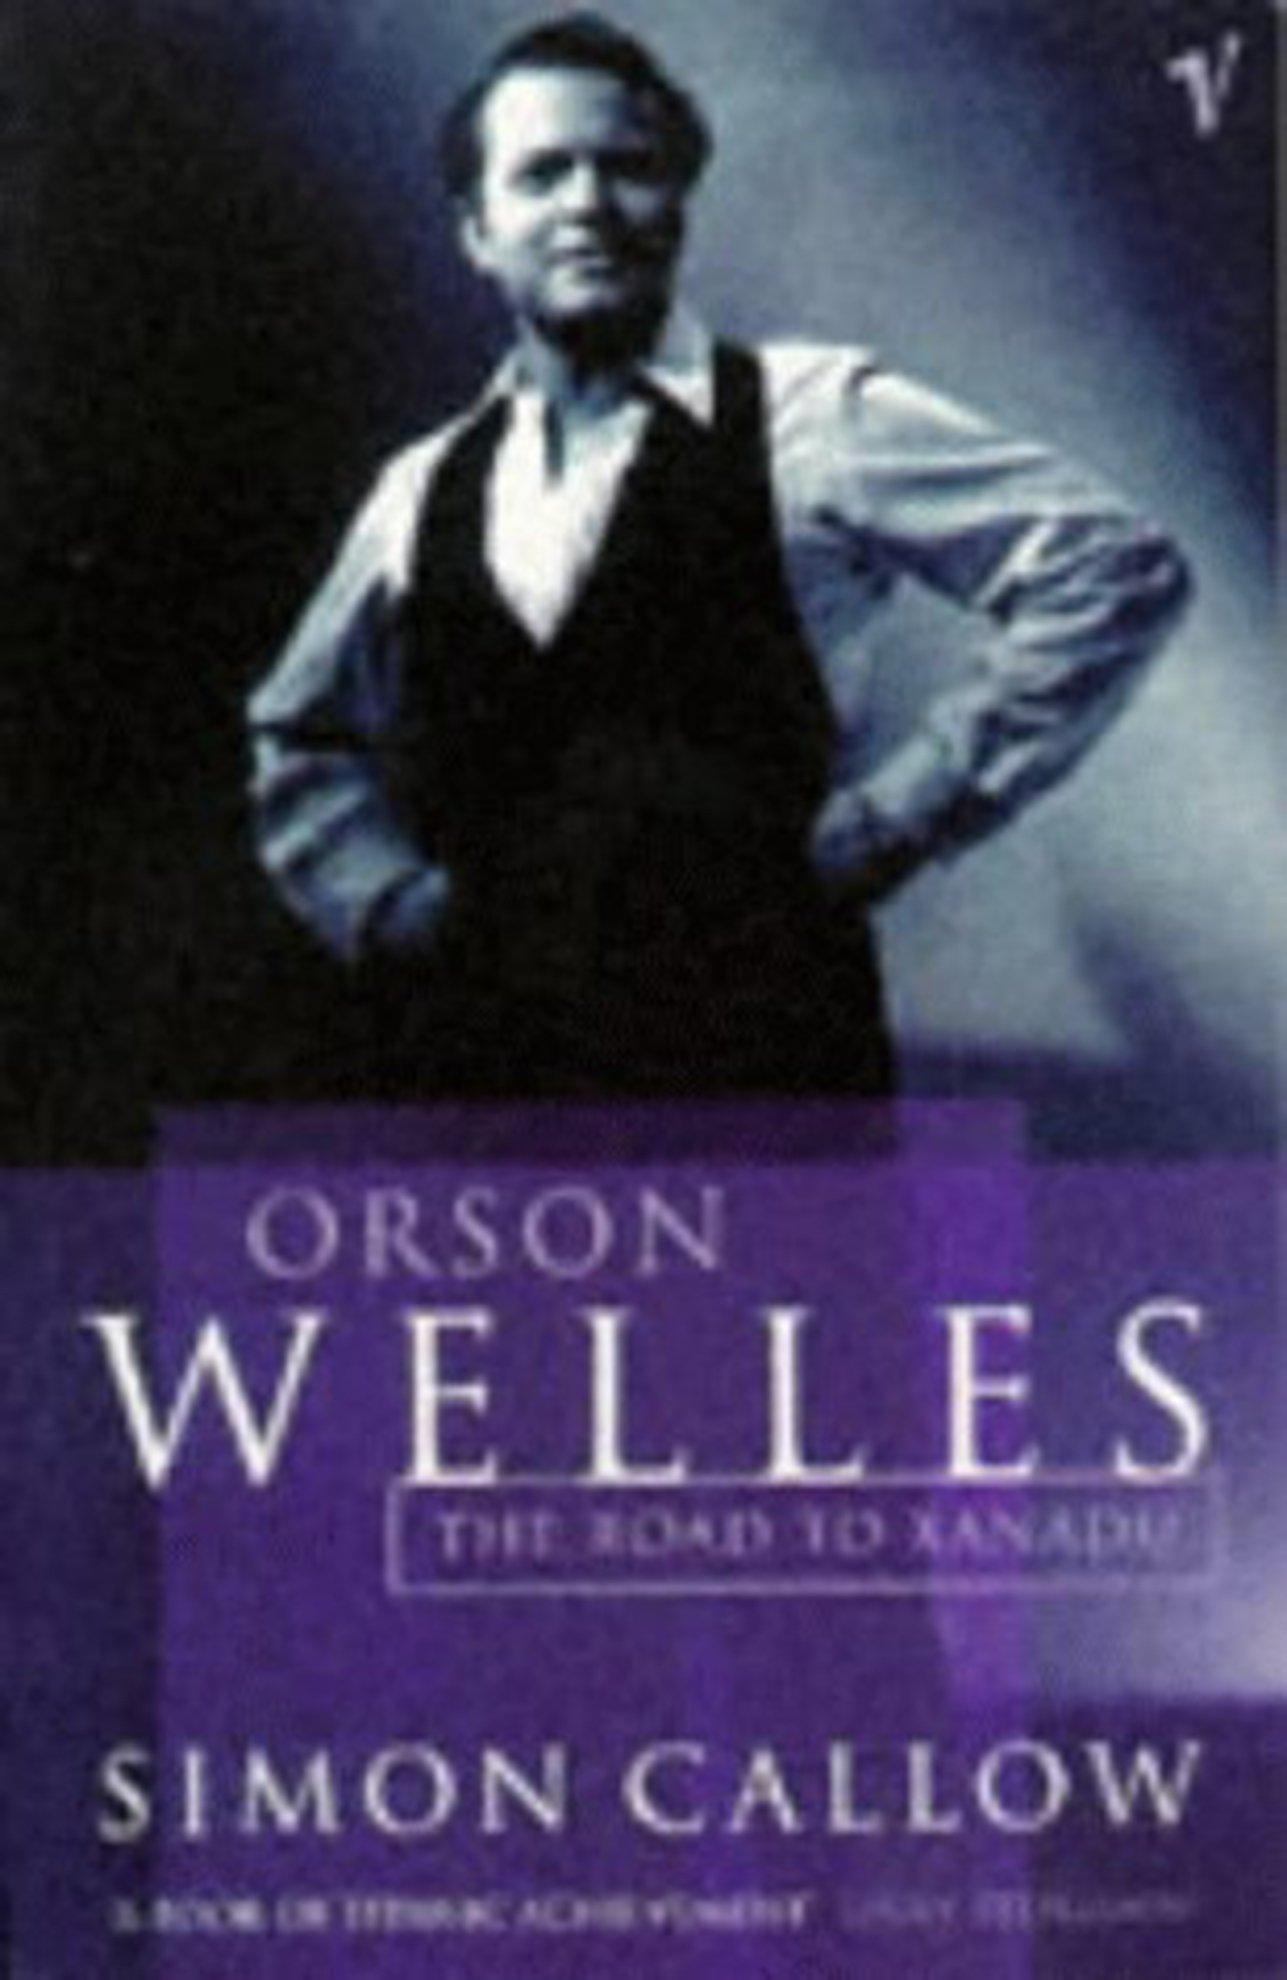 Grattis orson welles 100 ar